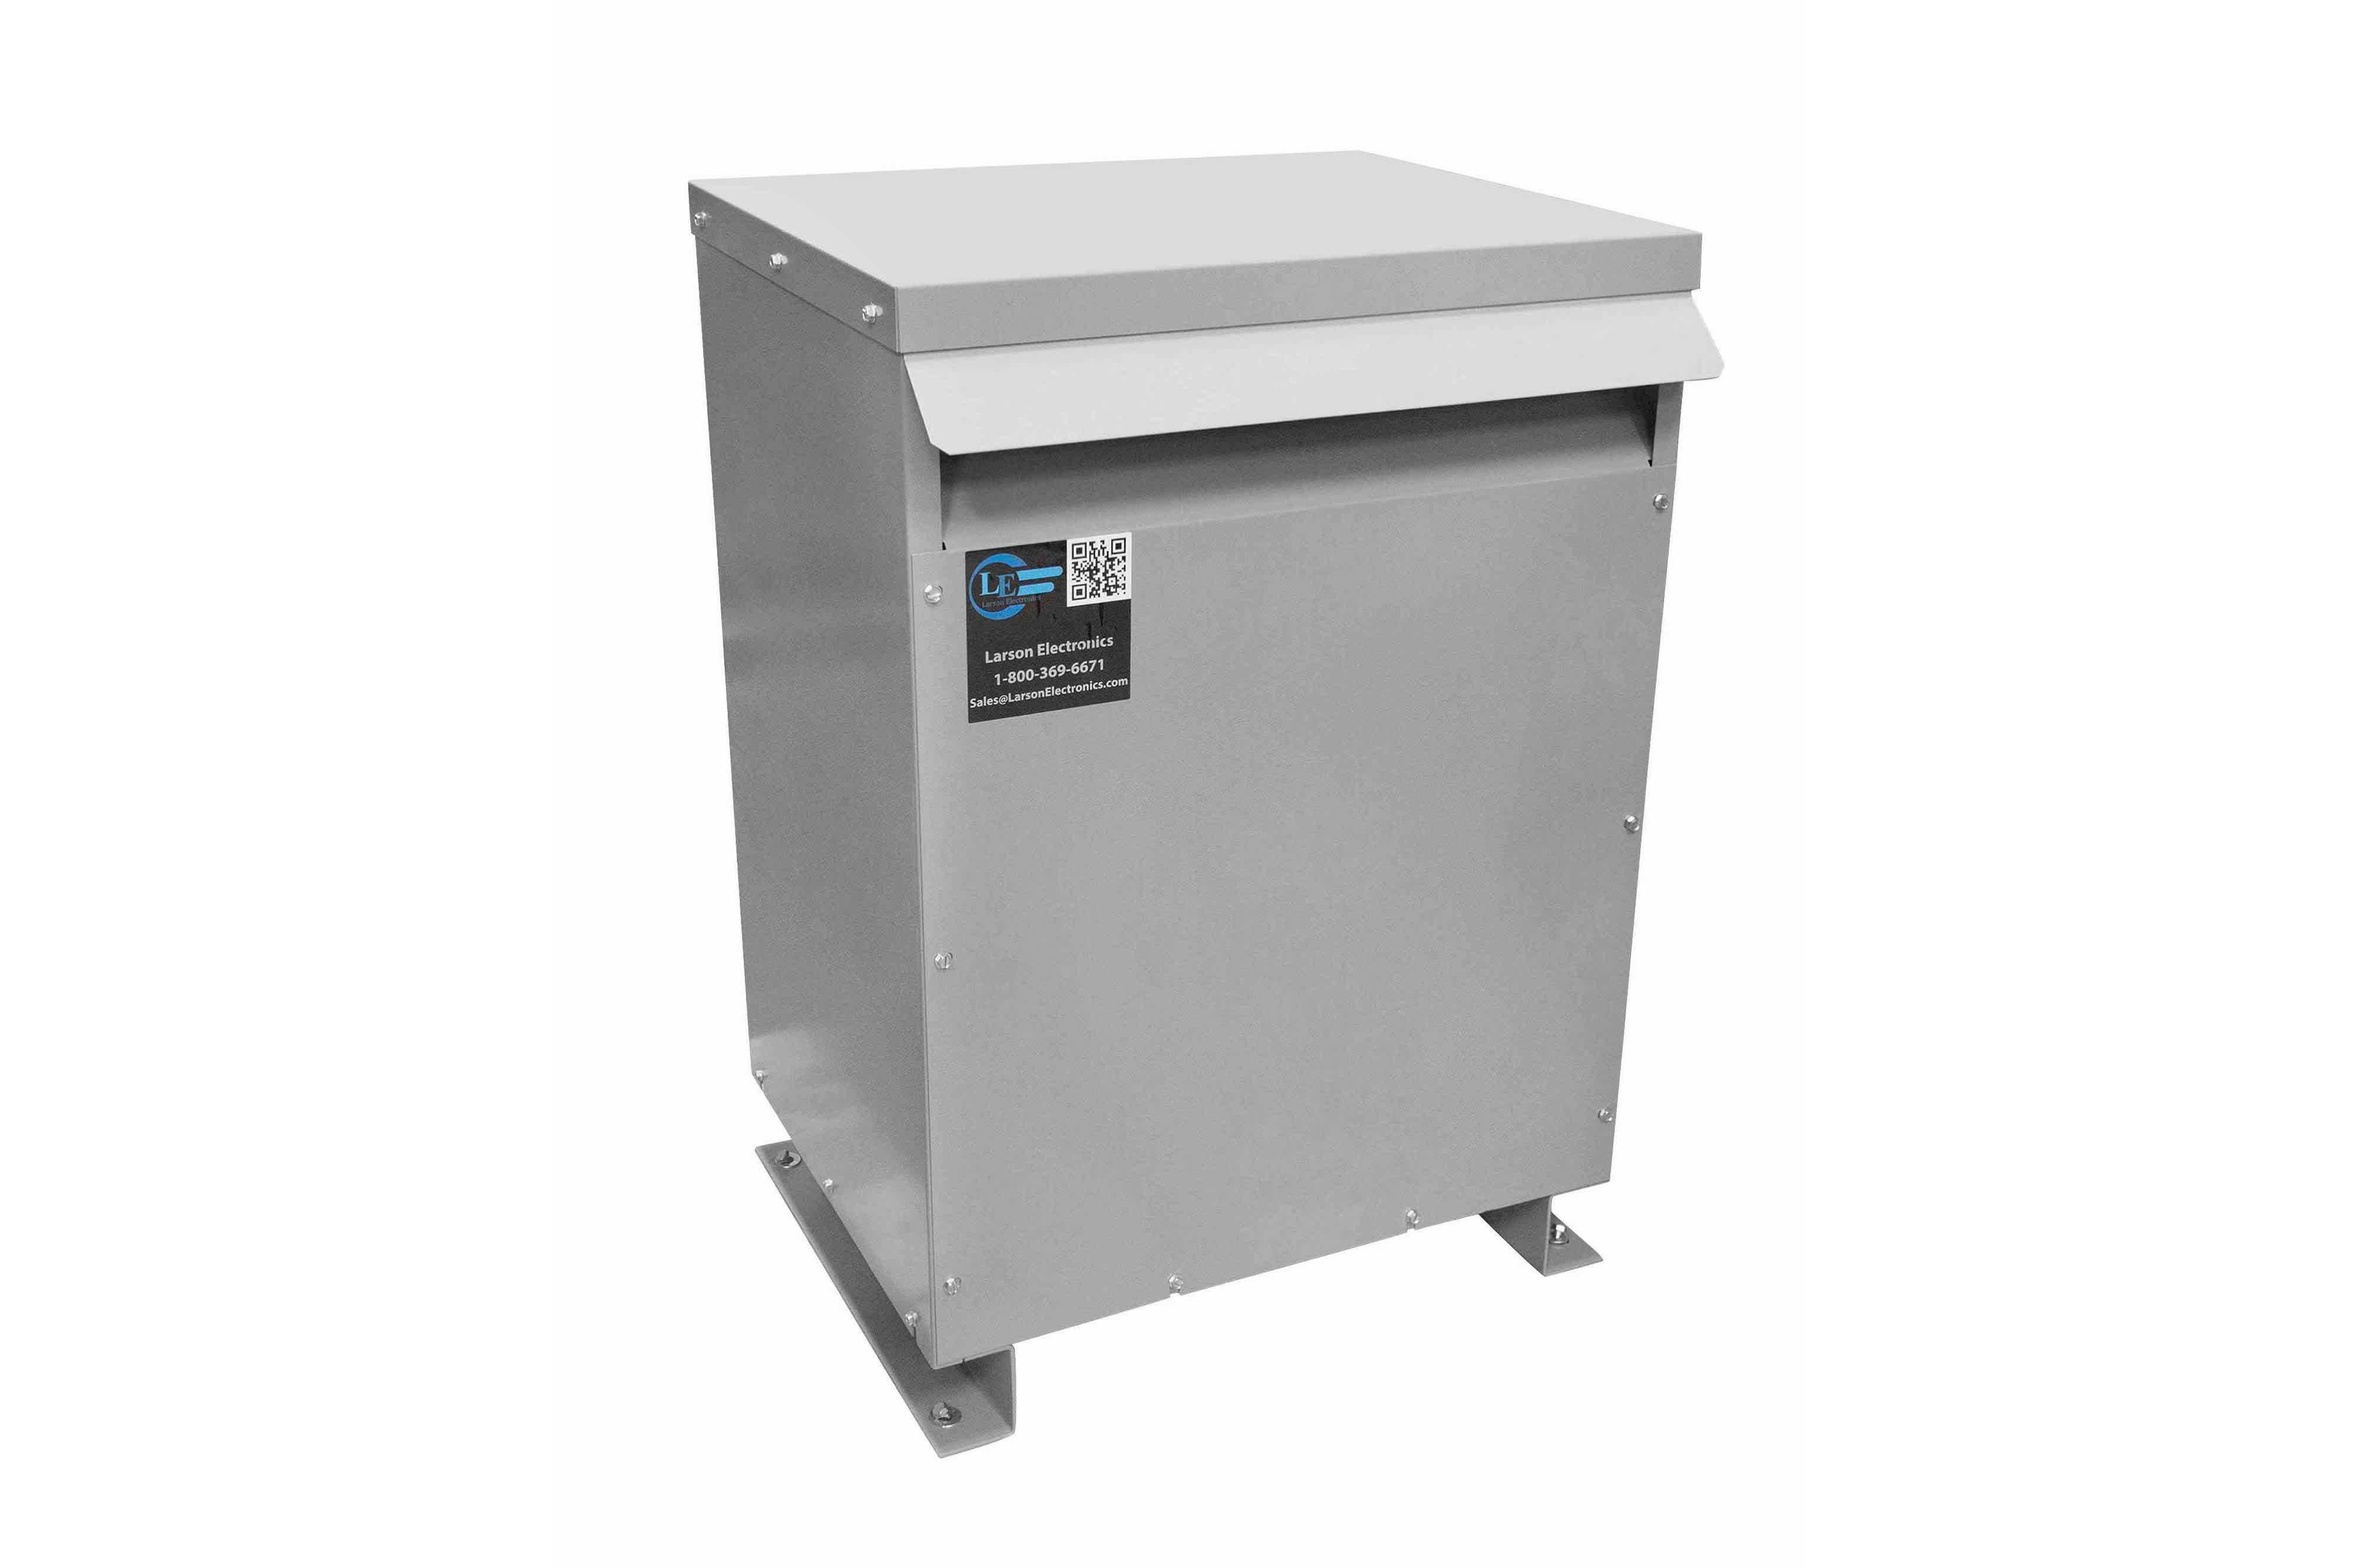 47.5 kVA 3PH Isolation Transformer, 208V Wye Primary, 415Y/240 Wye-N Secondary, N3R, Ventilated, 60 Hz